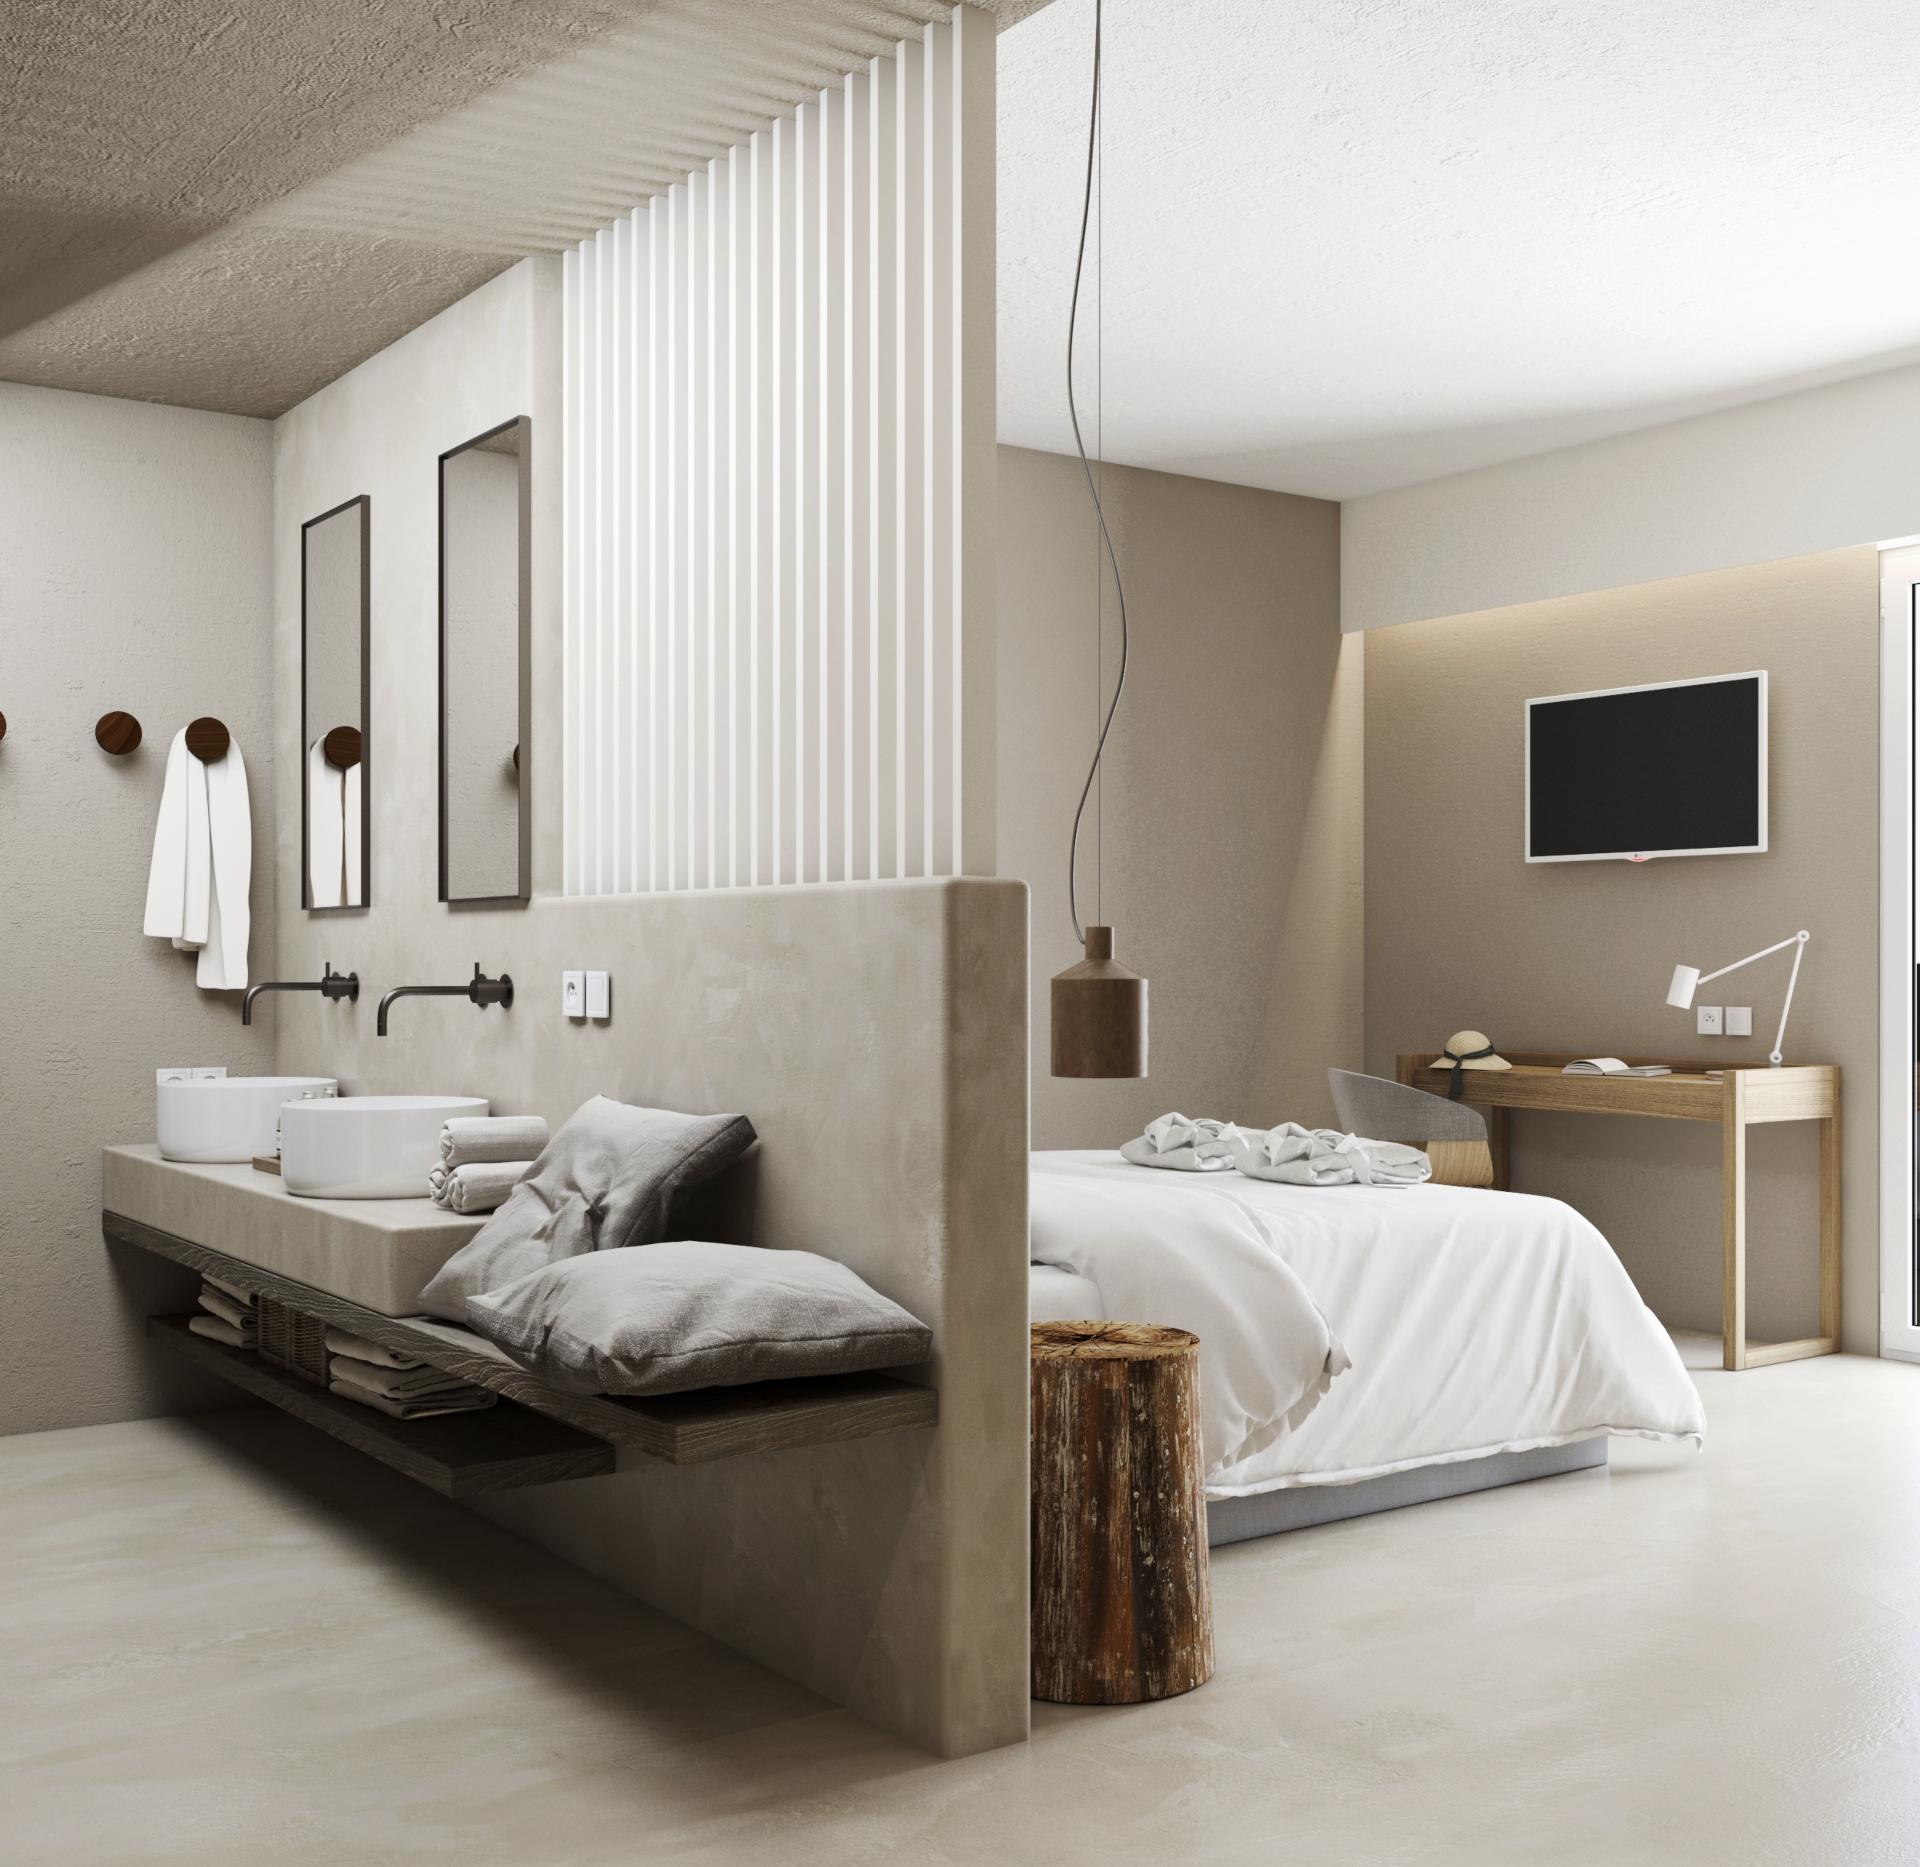 HOTEL ROOM-5